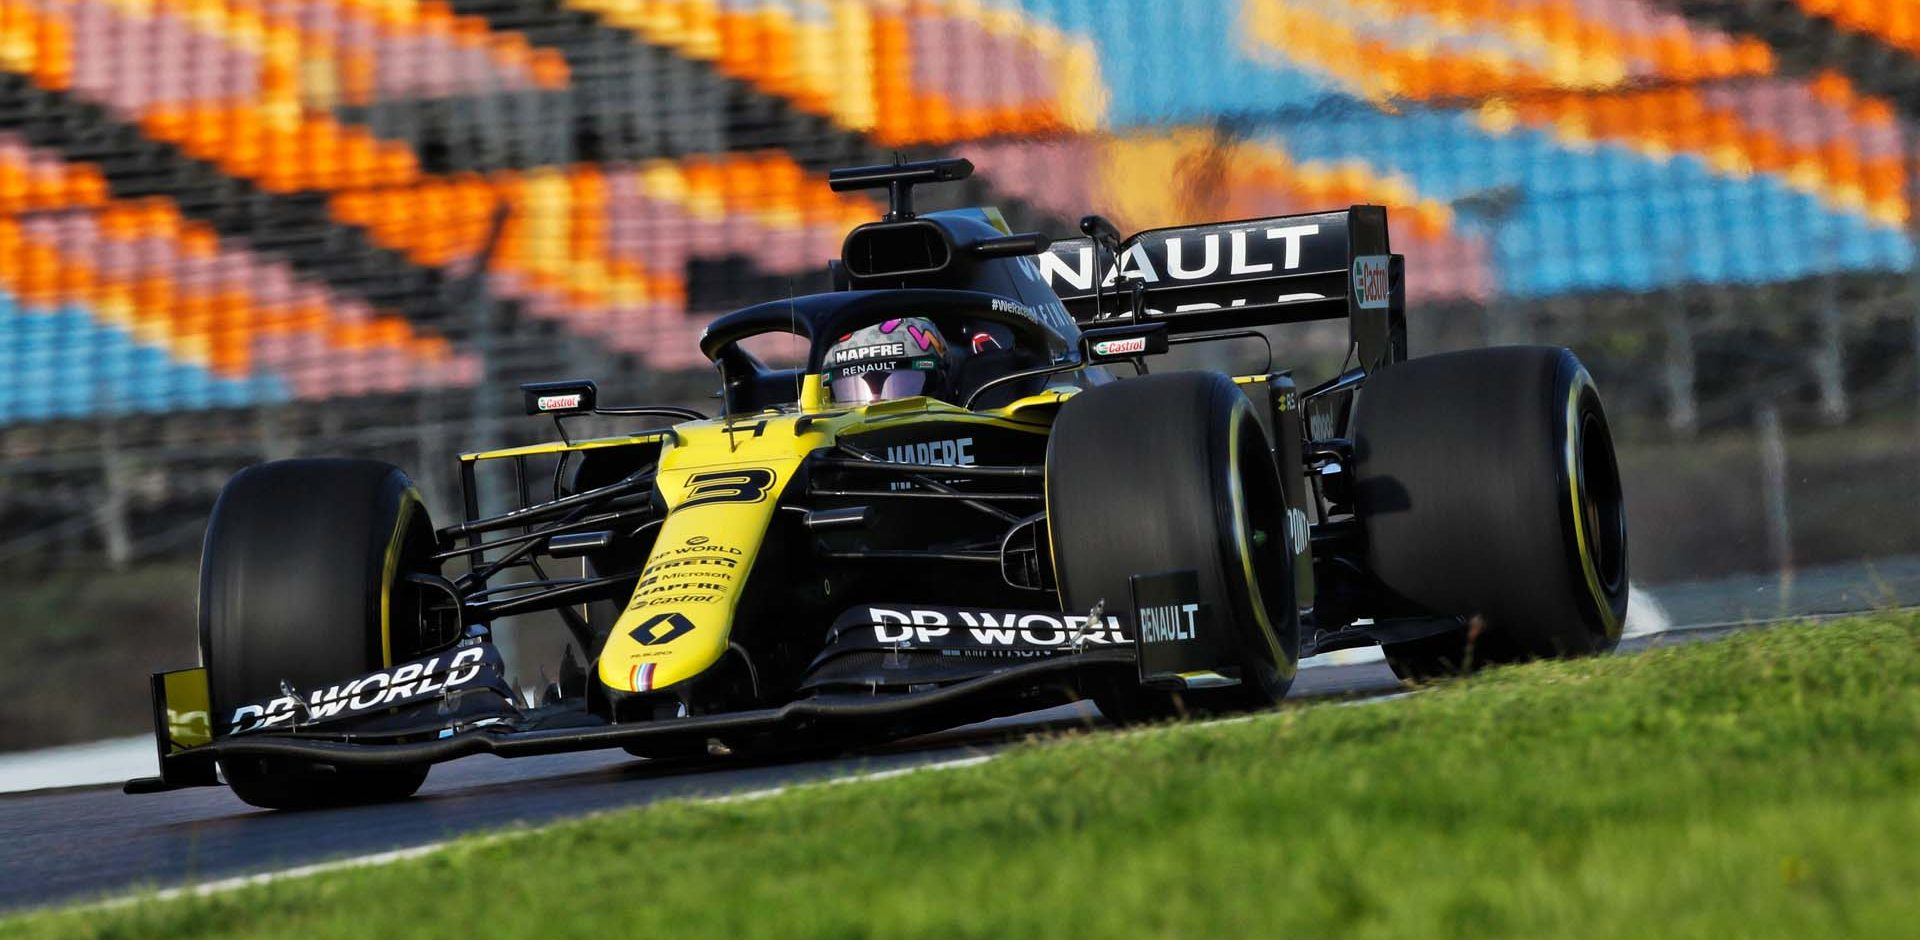 Daniel Ricciardo (AUS) Renault F1 Team RS20. Turkish Grand Prix, Friday 13th November 2020. Istanbul, Turkey.